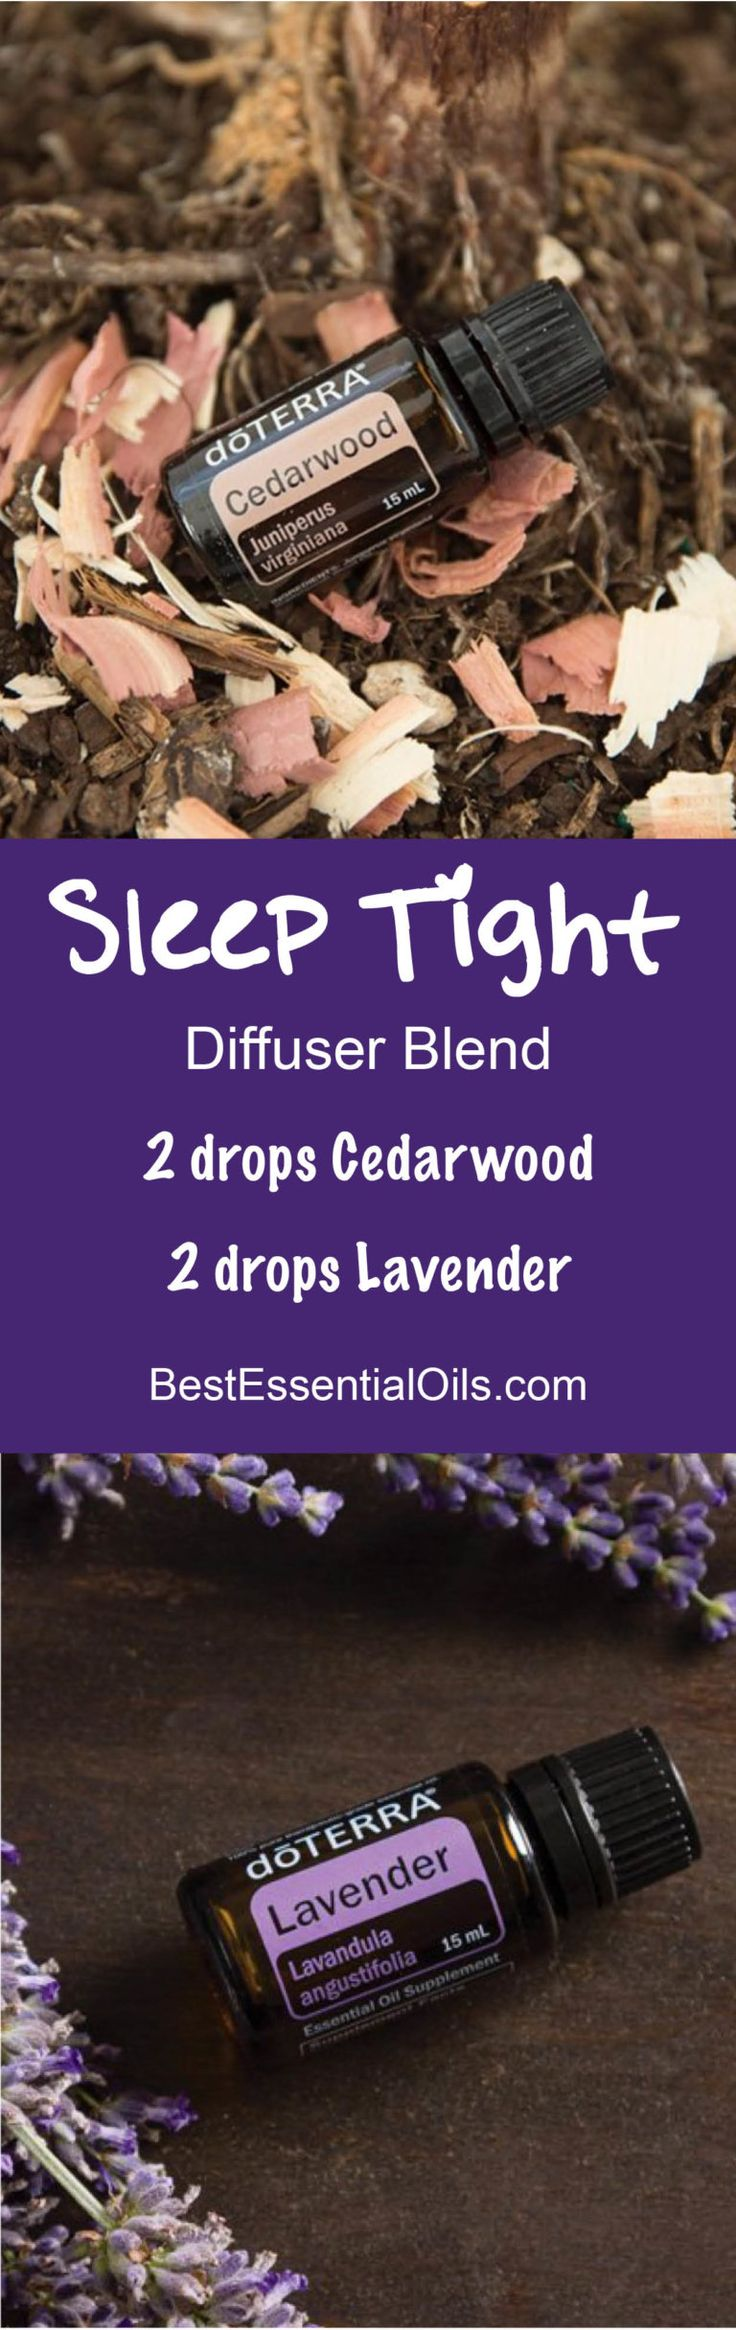 Sleep Tight doTERRA Diffuser Blend